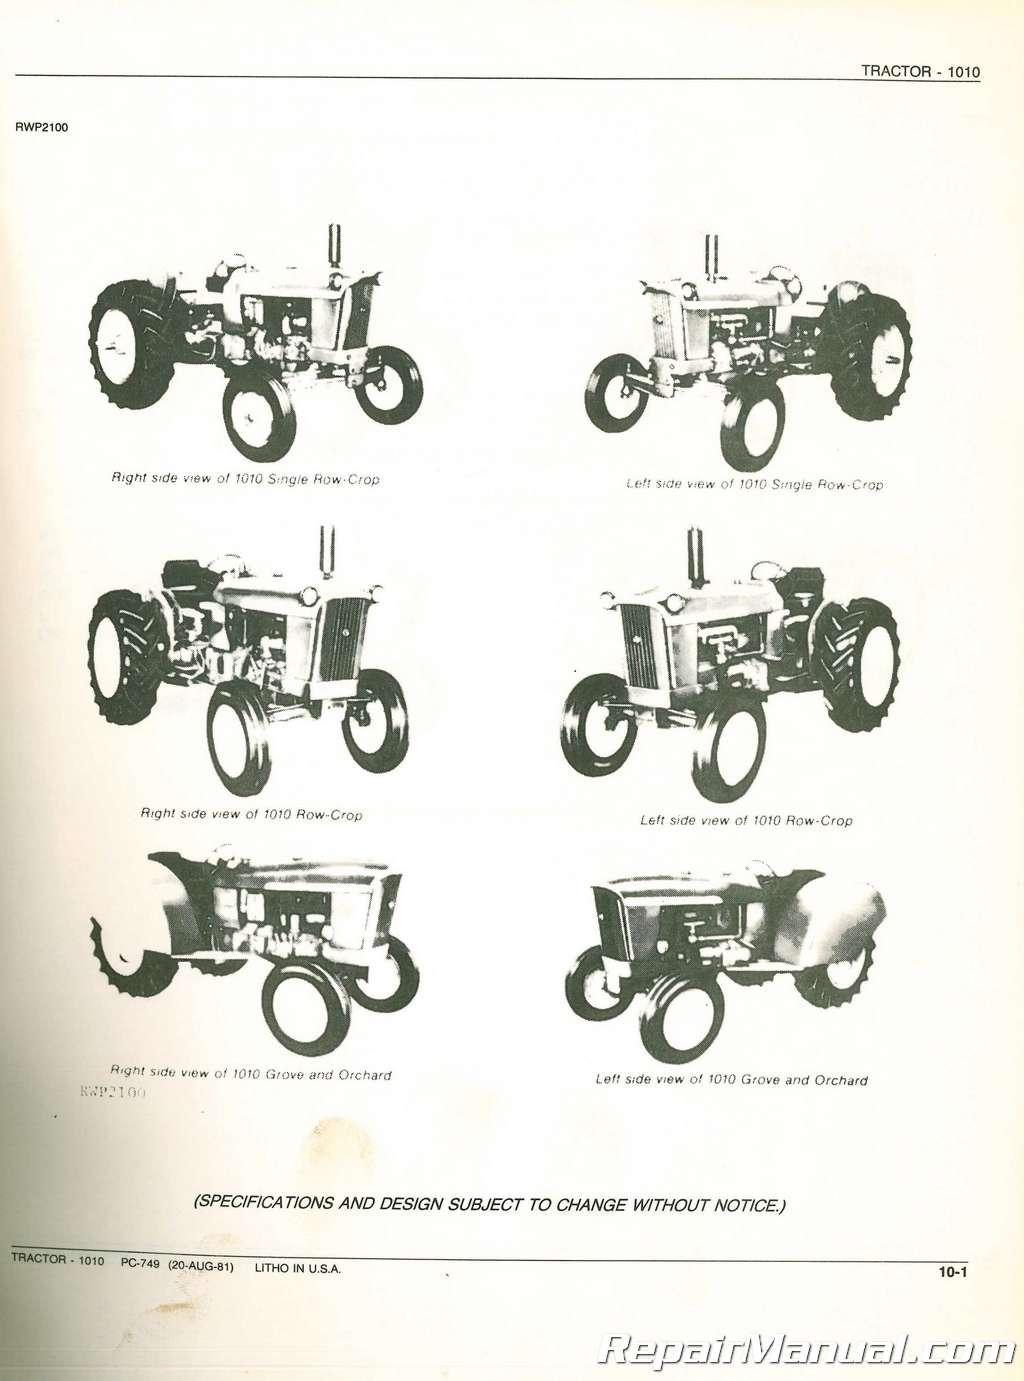 used john deere 1010 tractor parts catalog rh repairmanual com 1964 John Deere 1010 1963 John Deere 1010